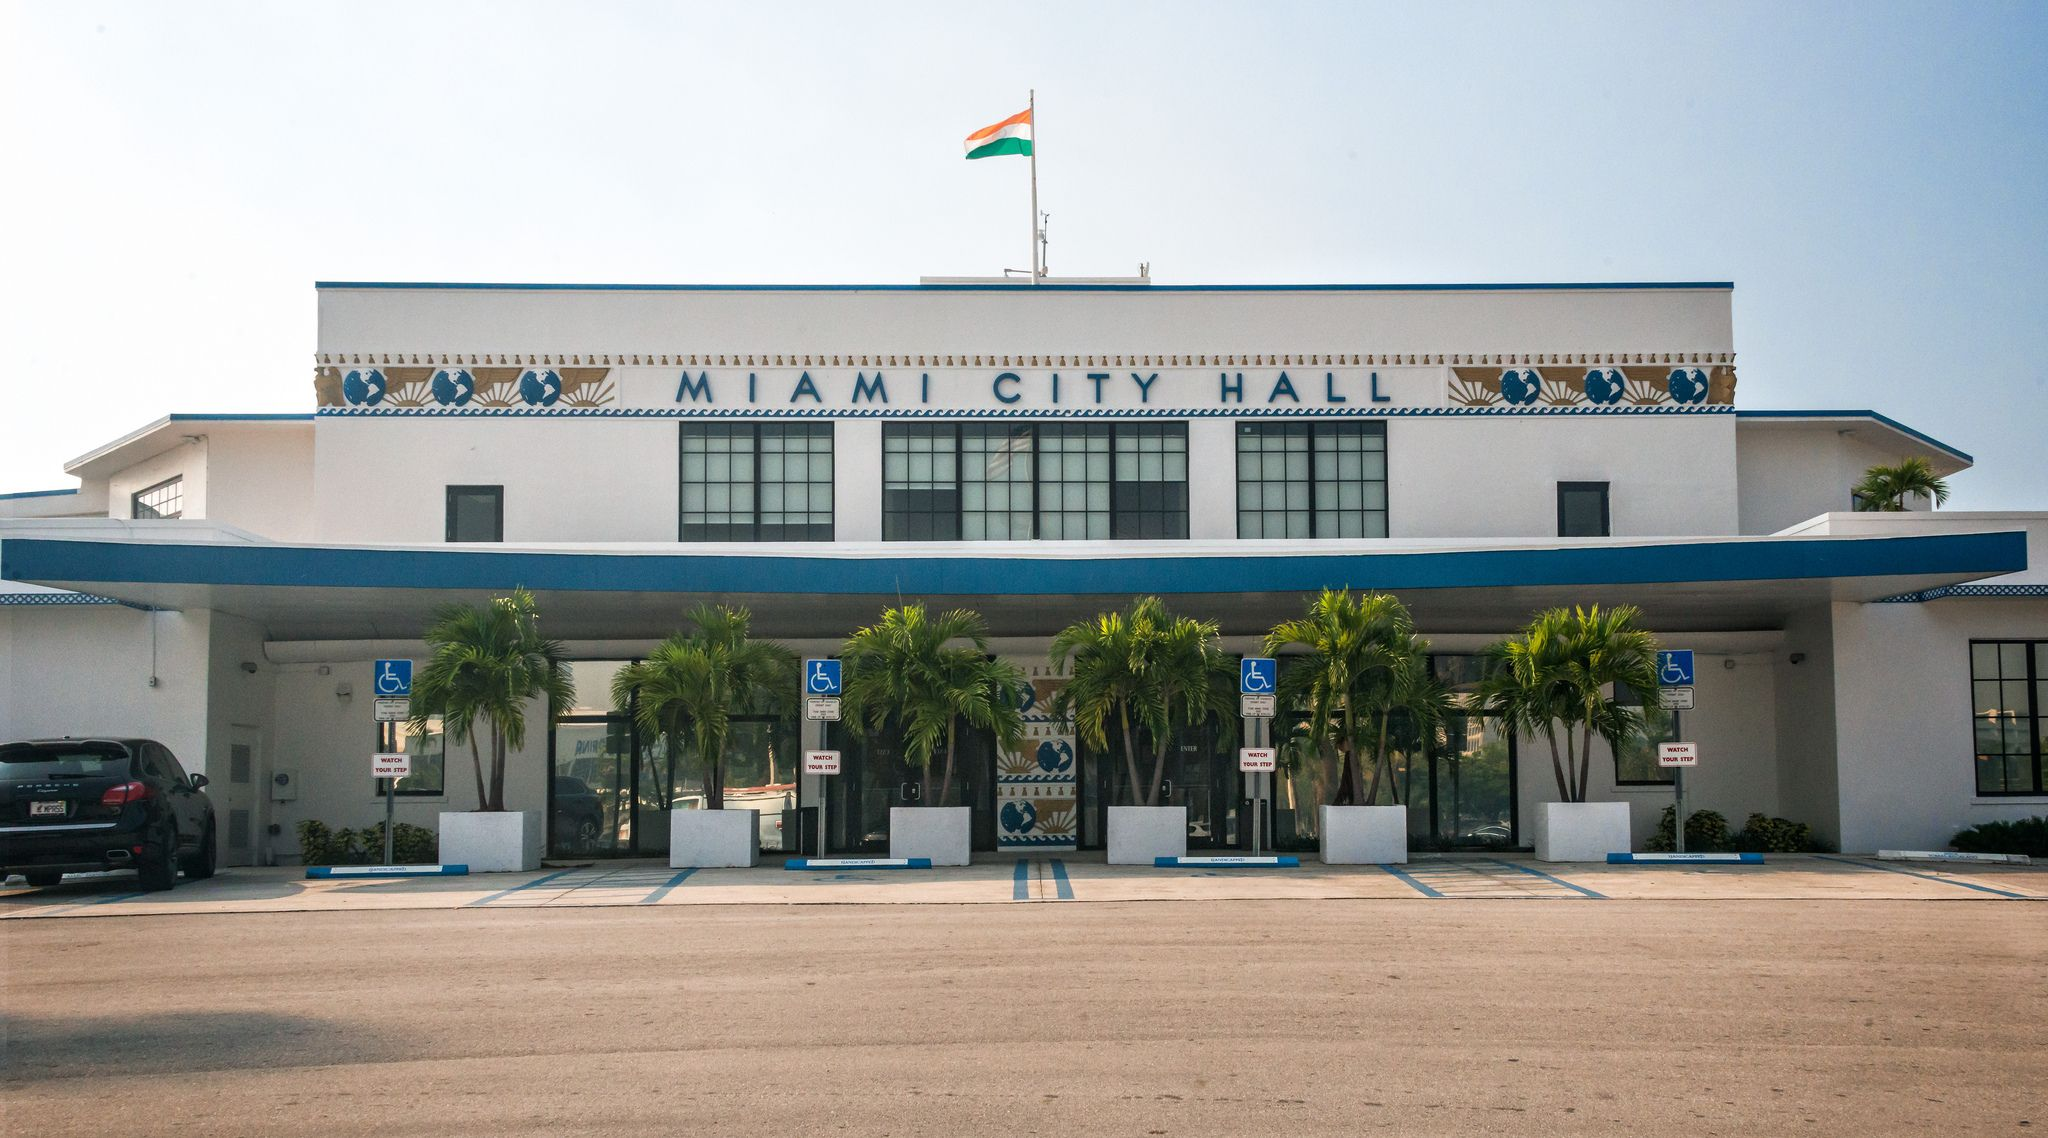 66056875edd181f03eeda46df71112b2 - Doctor's Office In Miami Gardens